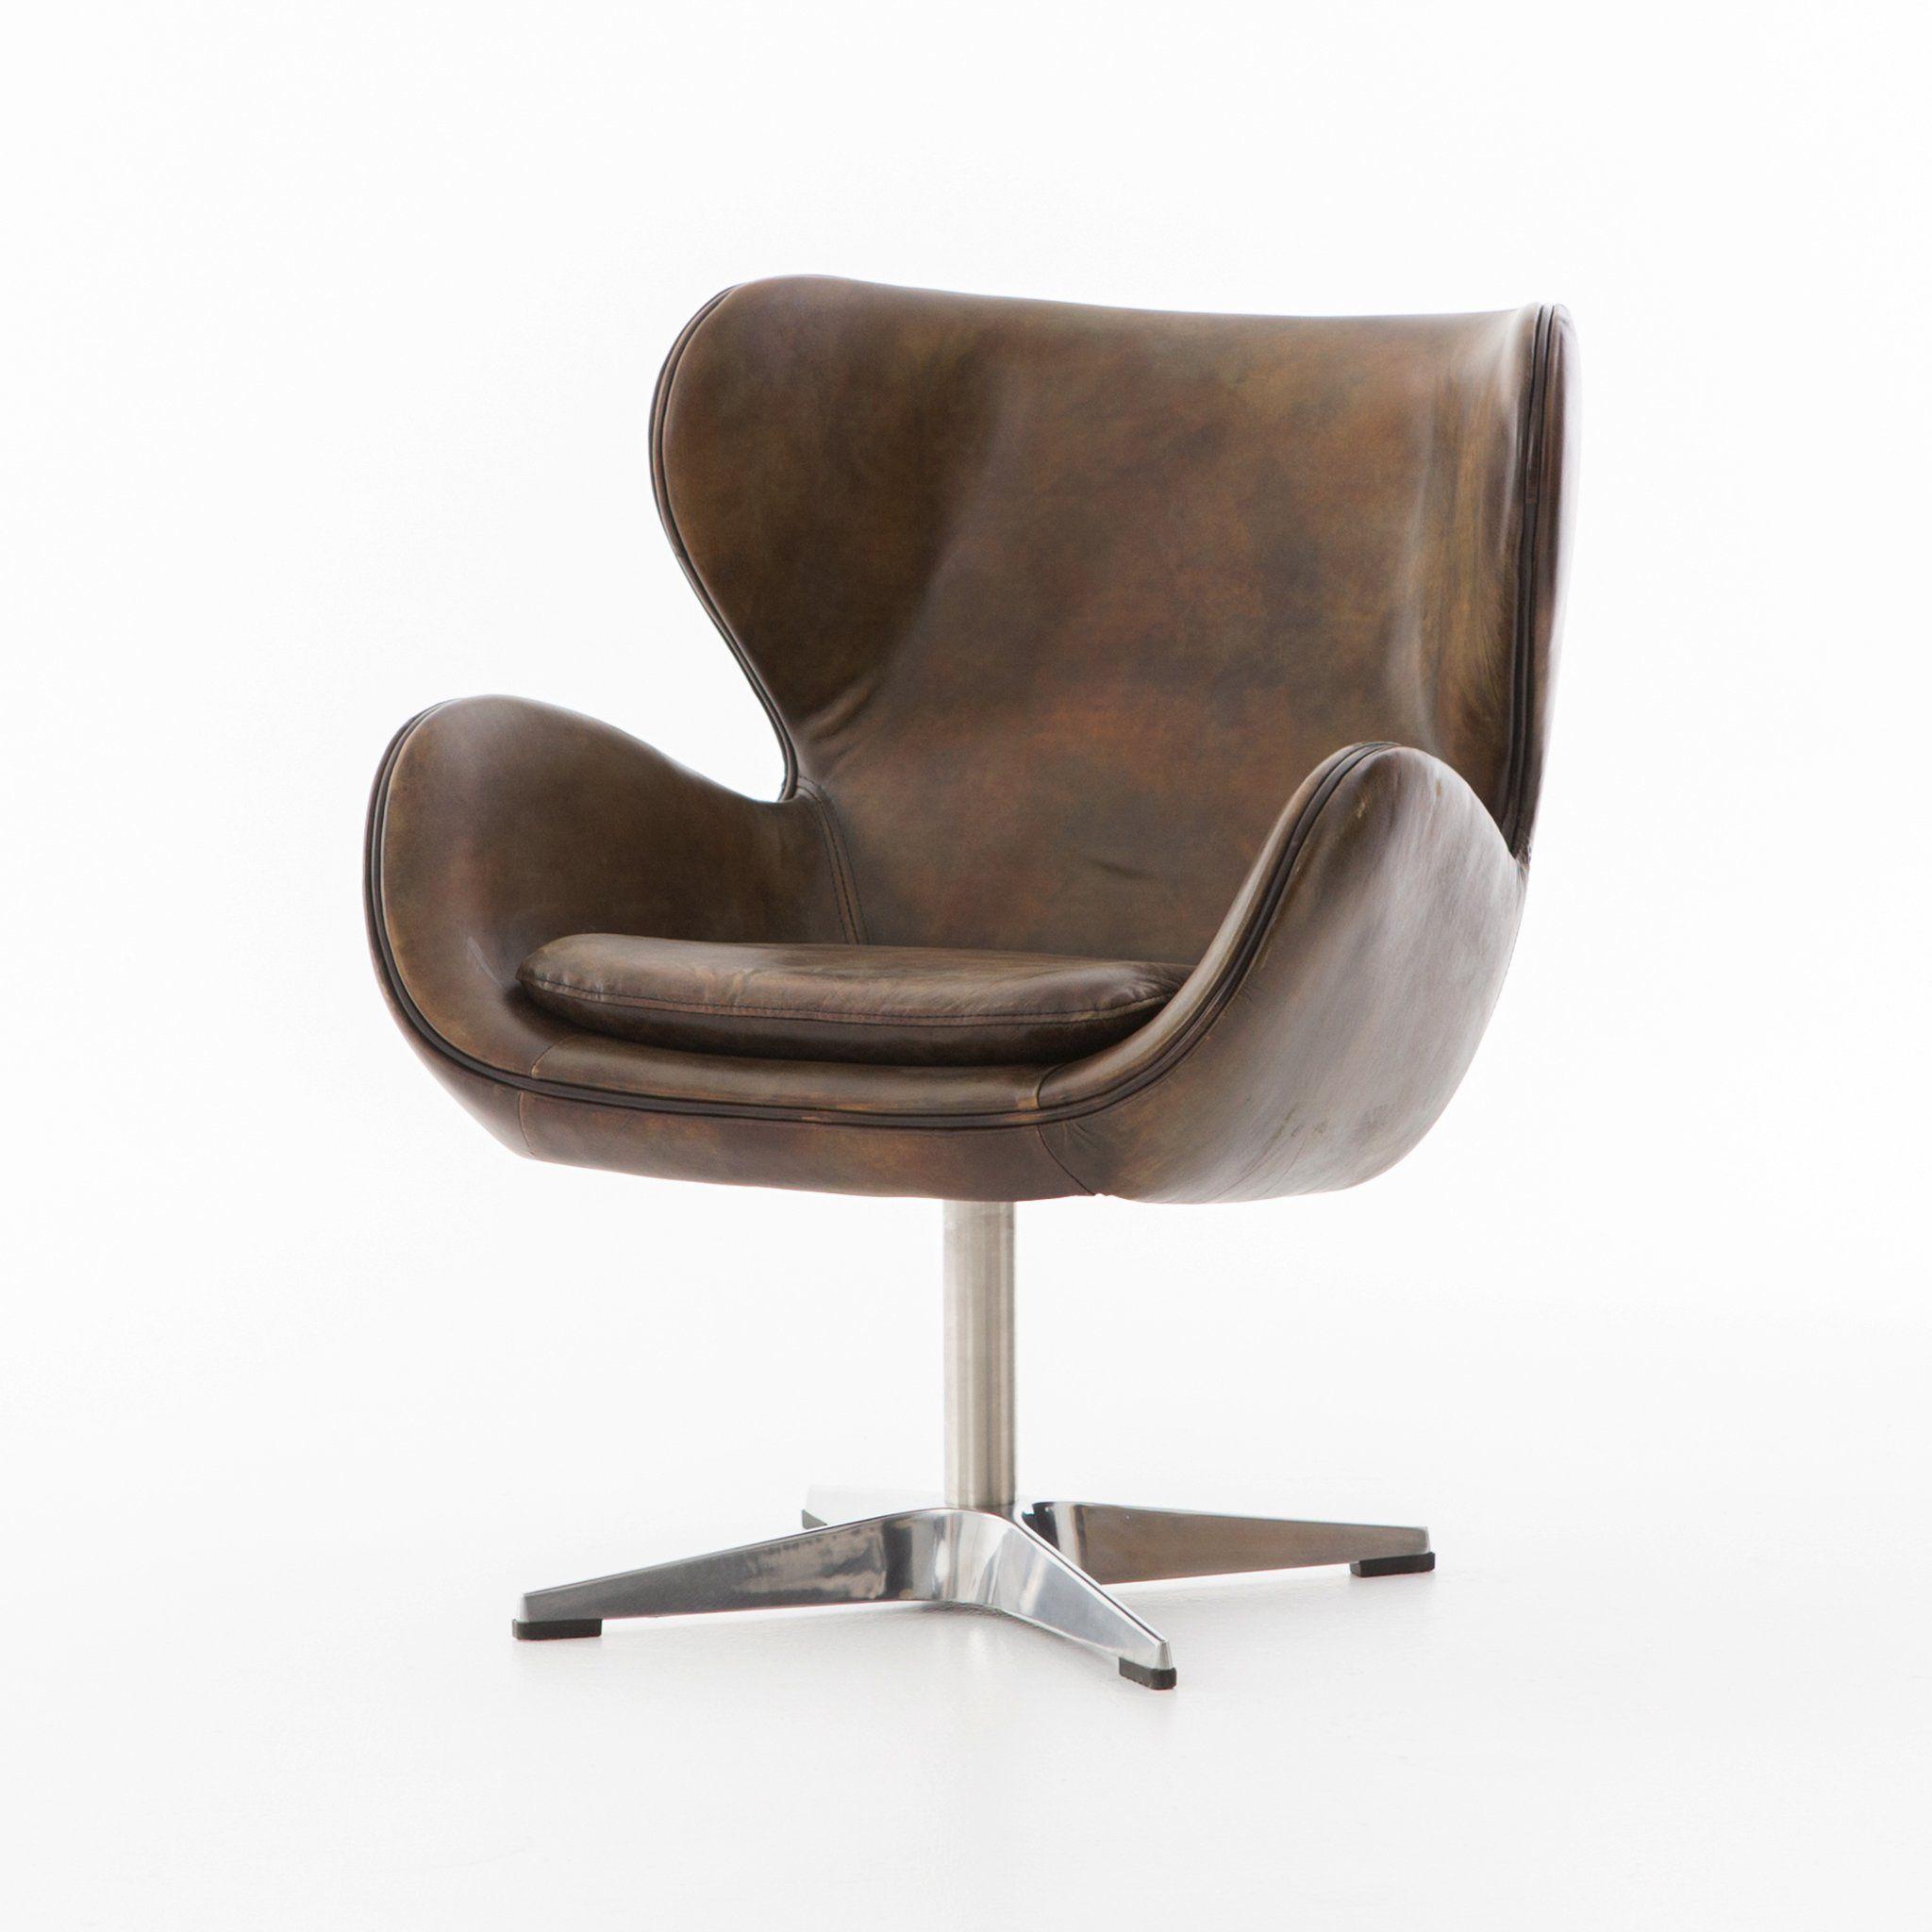 Carissa Swivel Chair – Old English Espresso | Swivel Chair, Espresso In Espresso Leather Swivel Chairs (Photo 1 of 20)